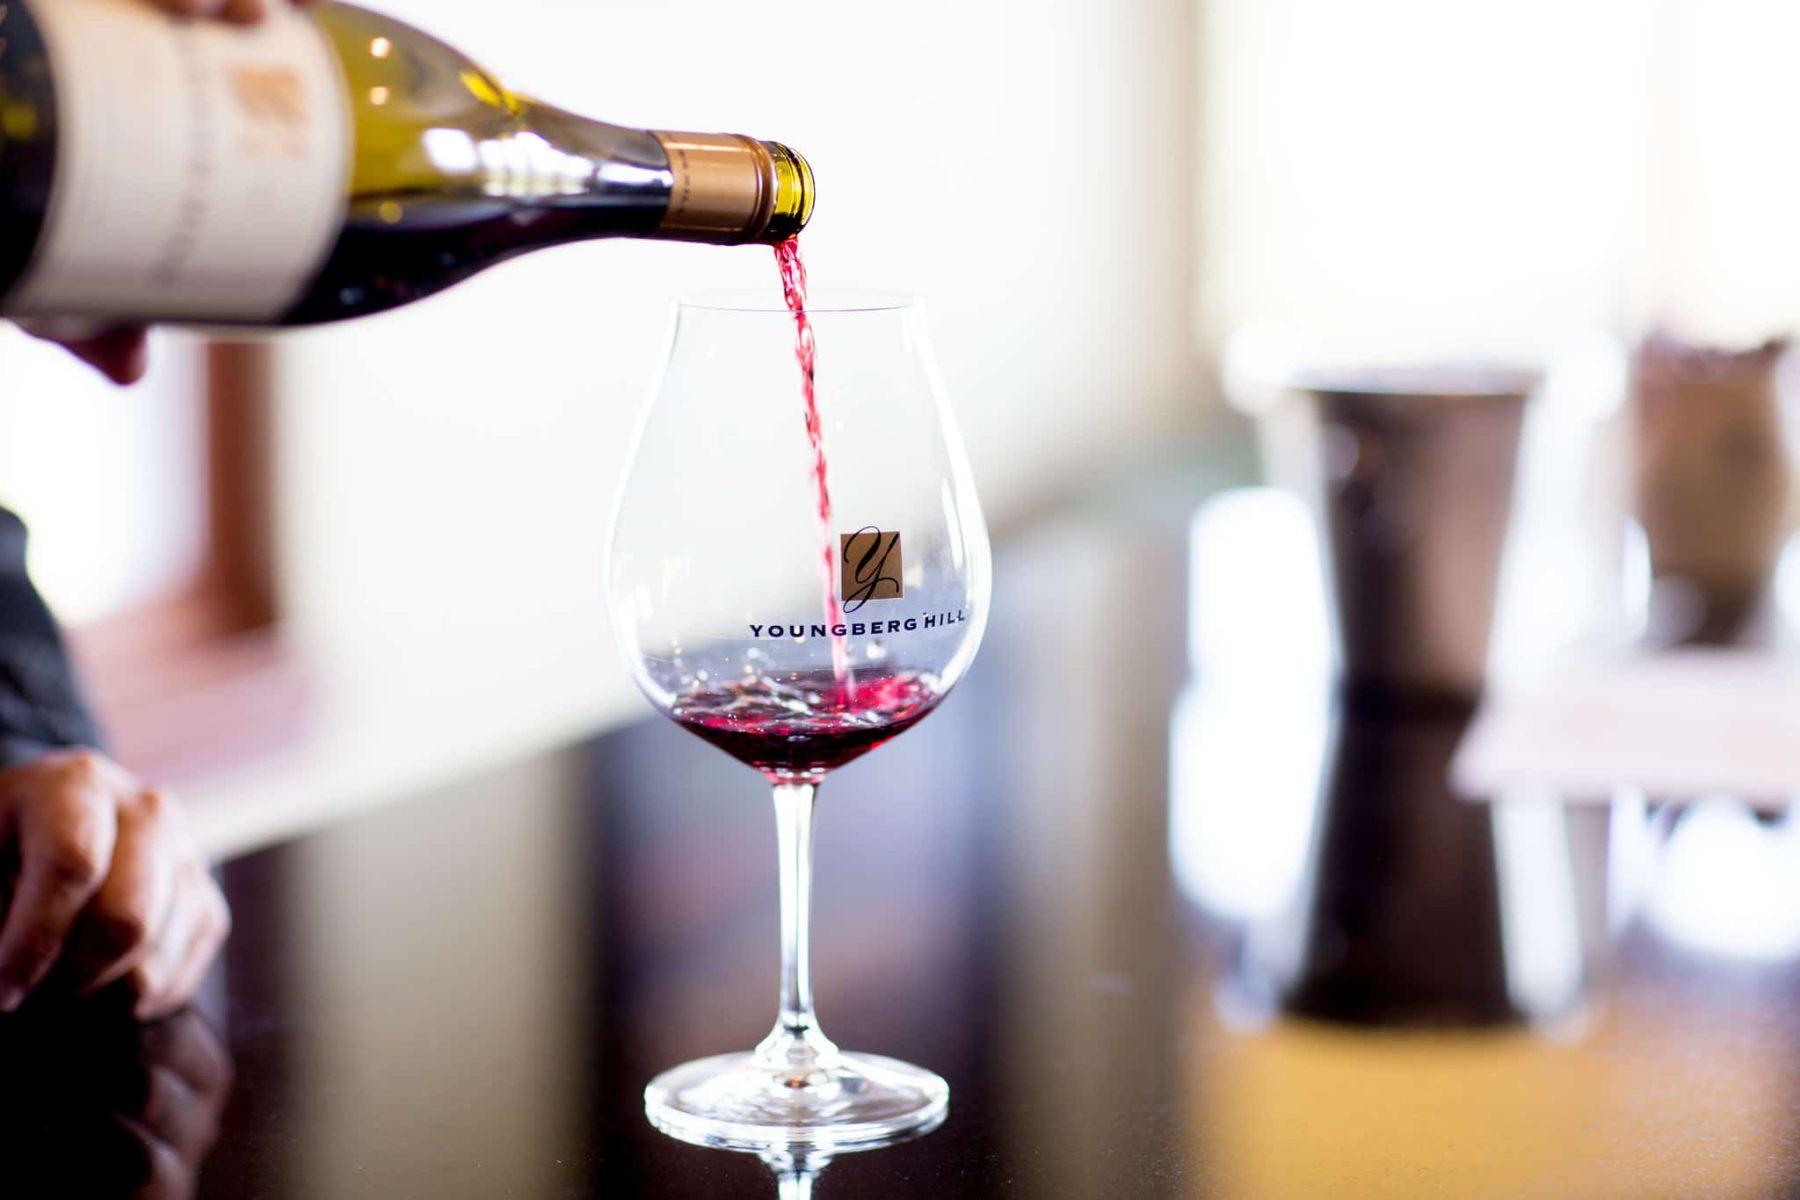 Oregon's Willamette Valley Pinot Noir